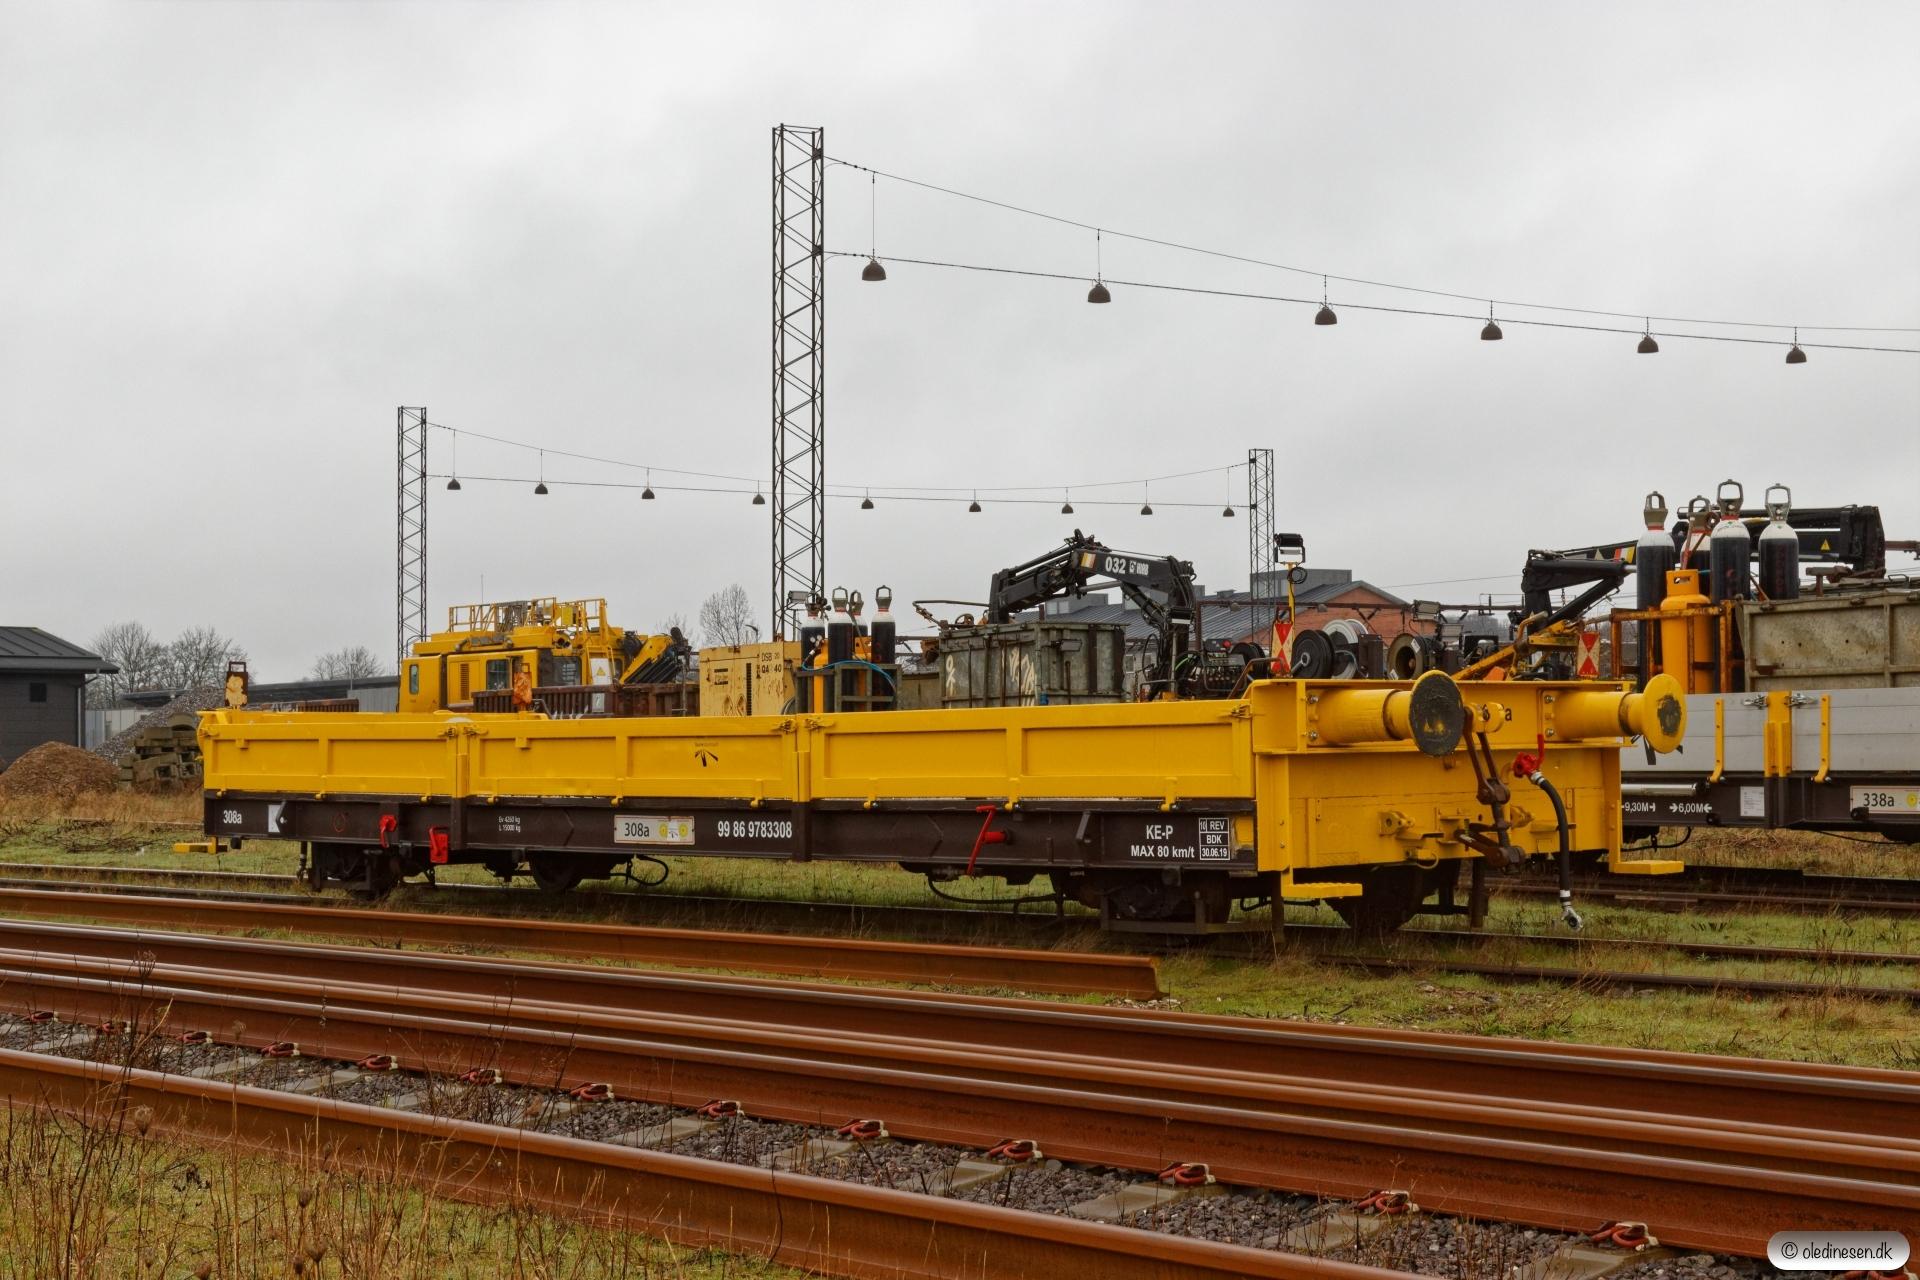 ENT 99 86 9783 308-0. Odense 29.02.2020.